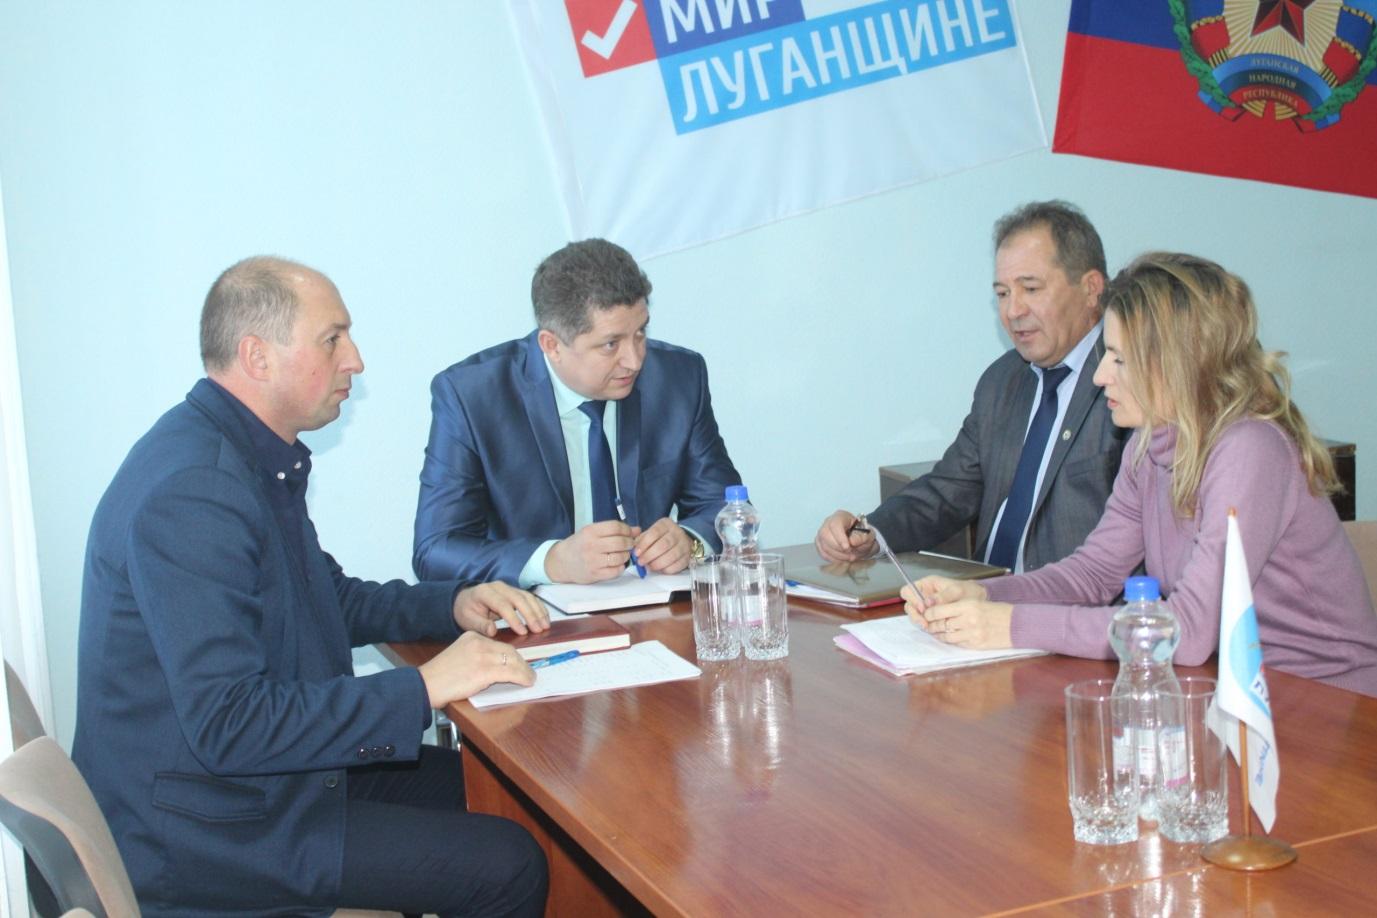 Министр образования и науки ЛНР Сергей Цемкало встретился с жителями Славяносербска 1